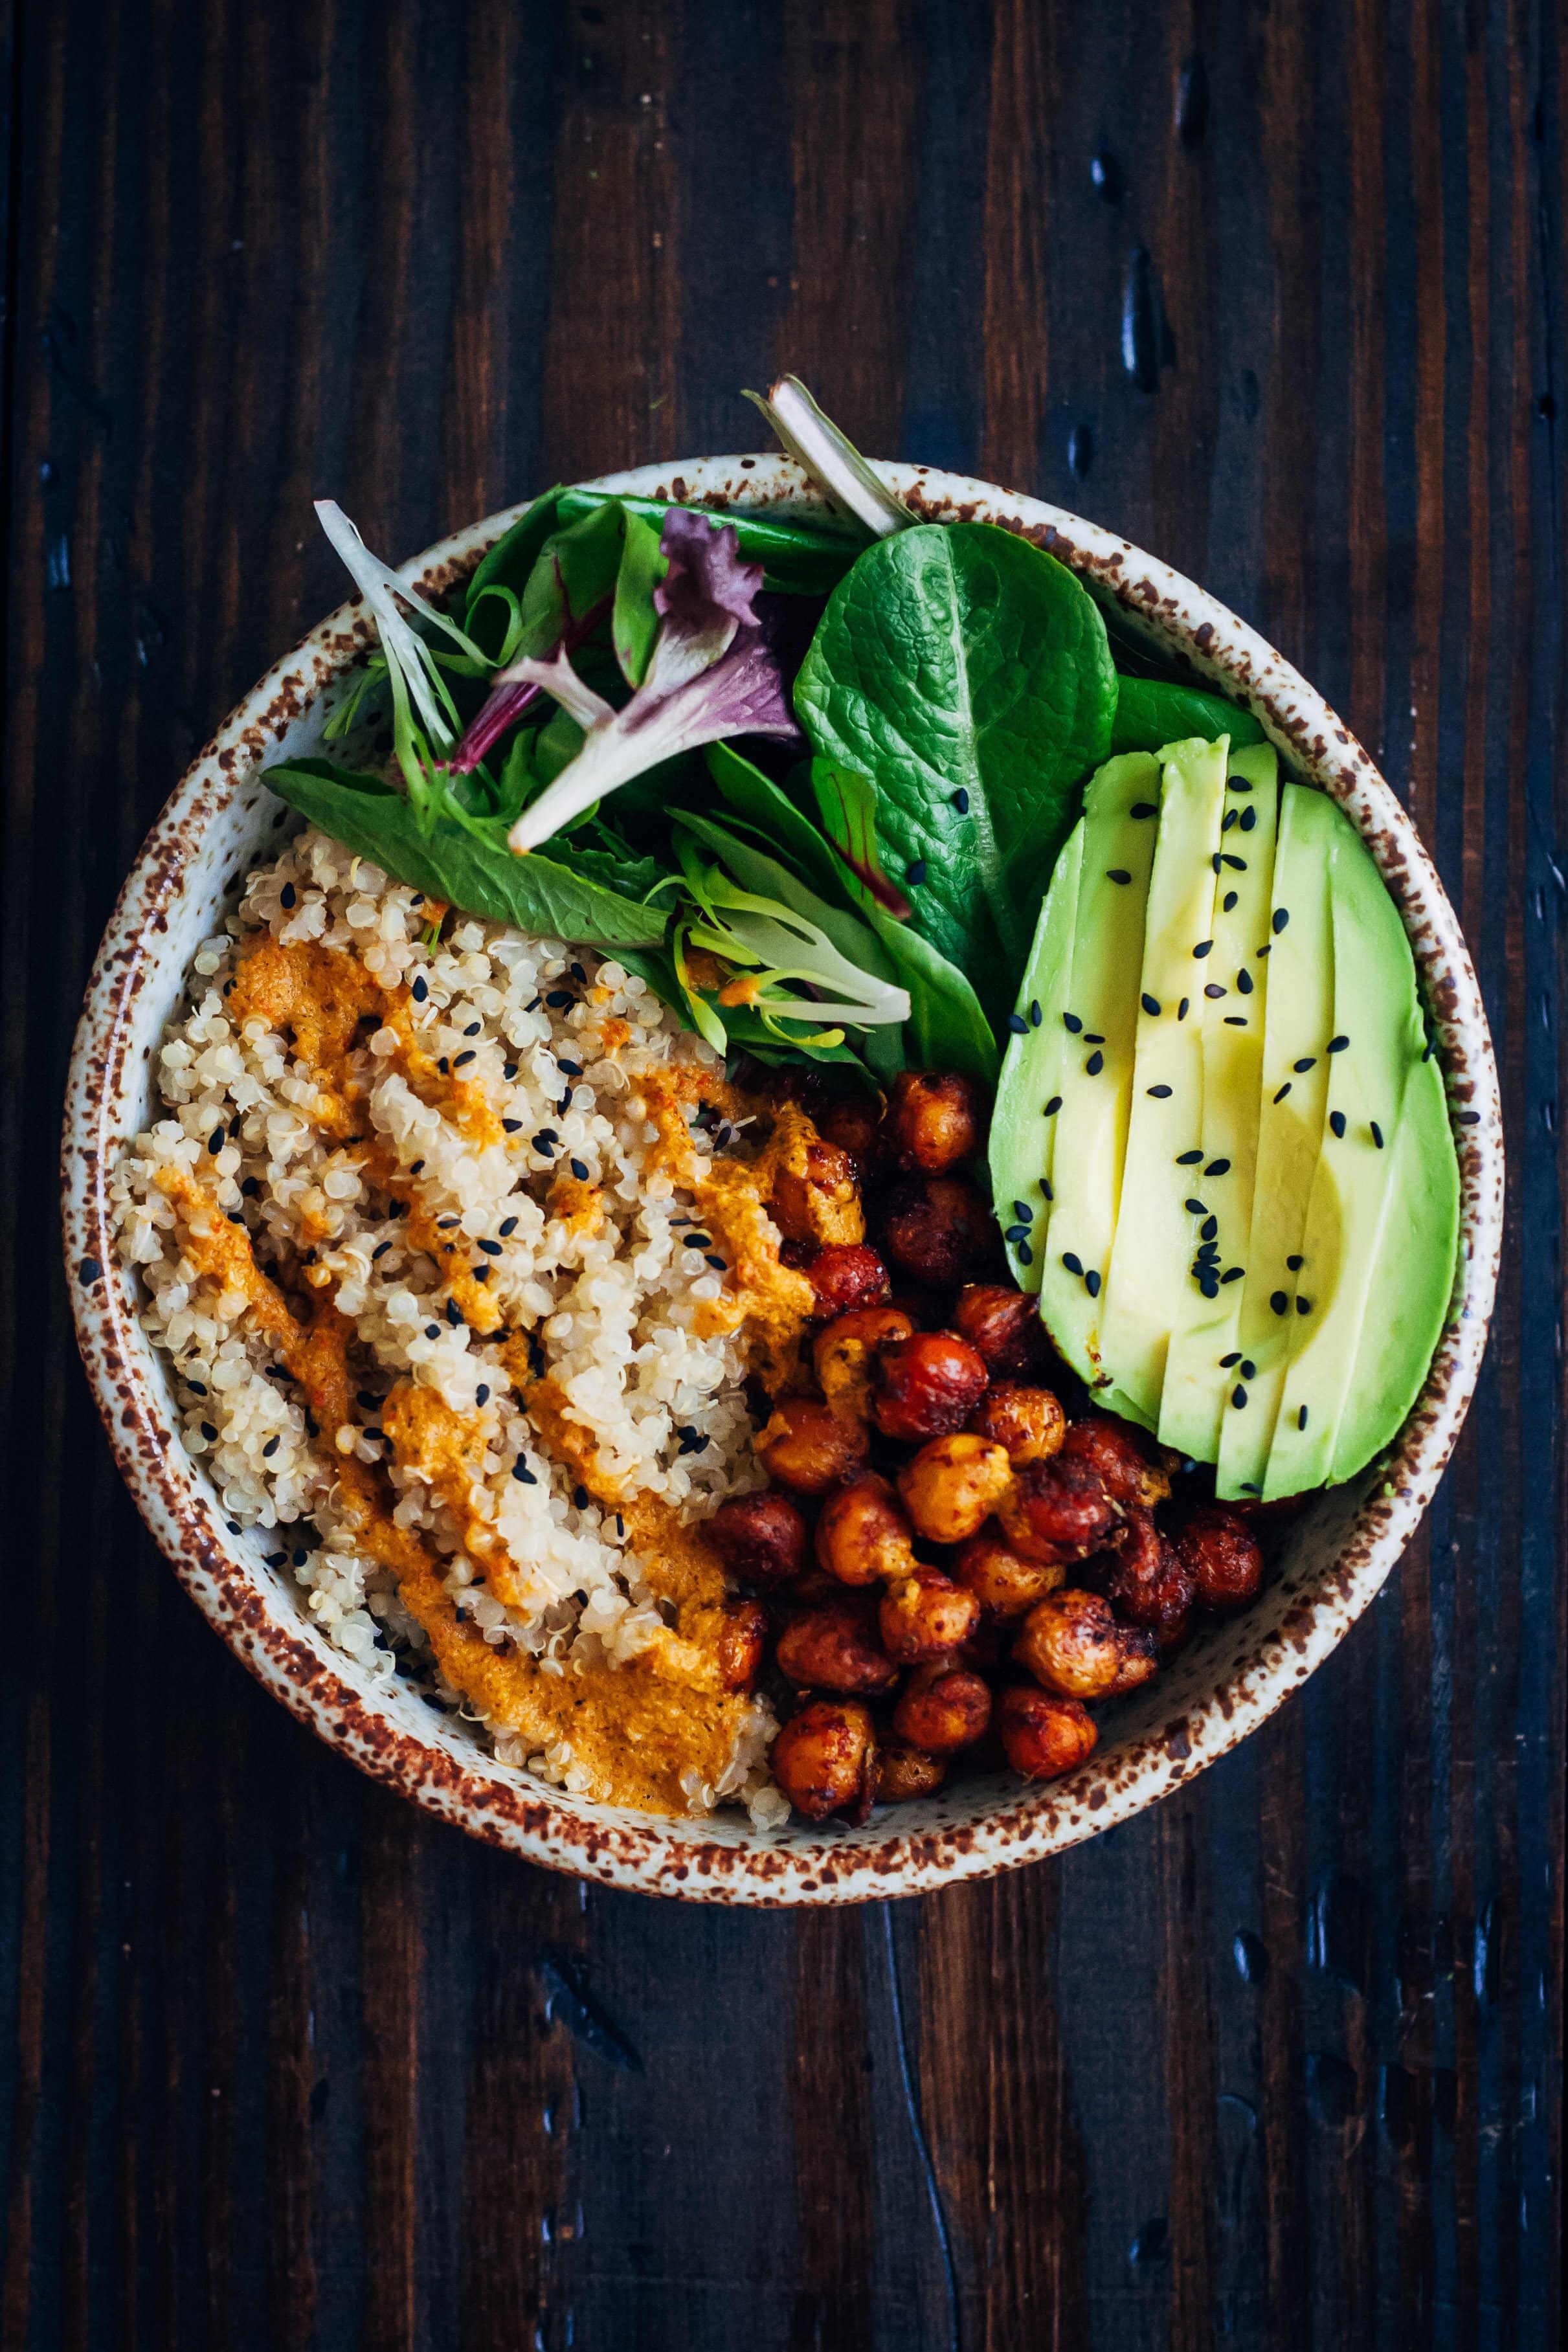 Healthy Vegan Dinner Recipes  25 Vegan Dinner Recipes Easy Healthy Plant based